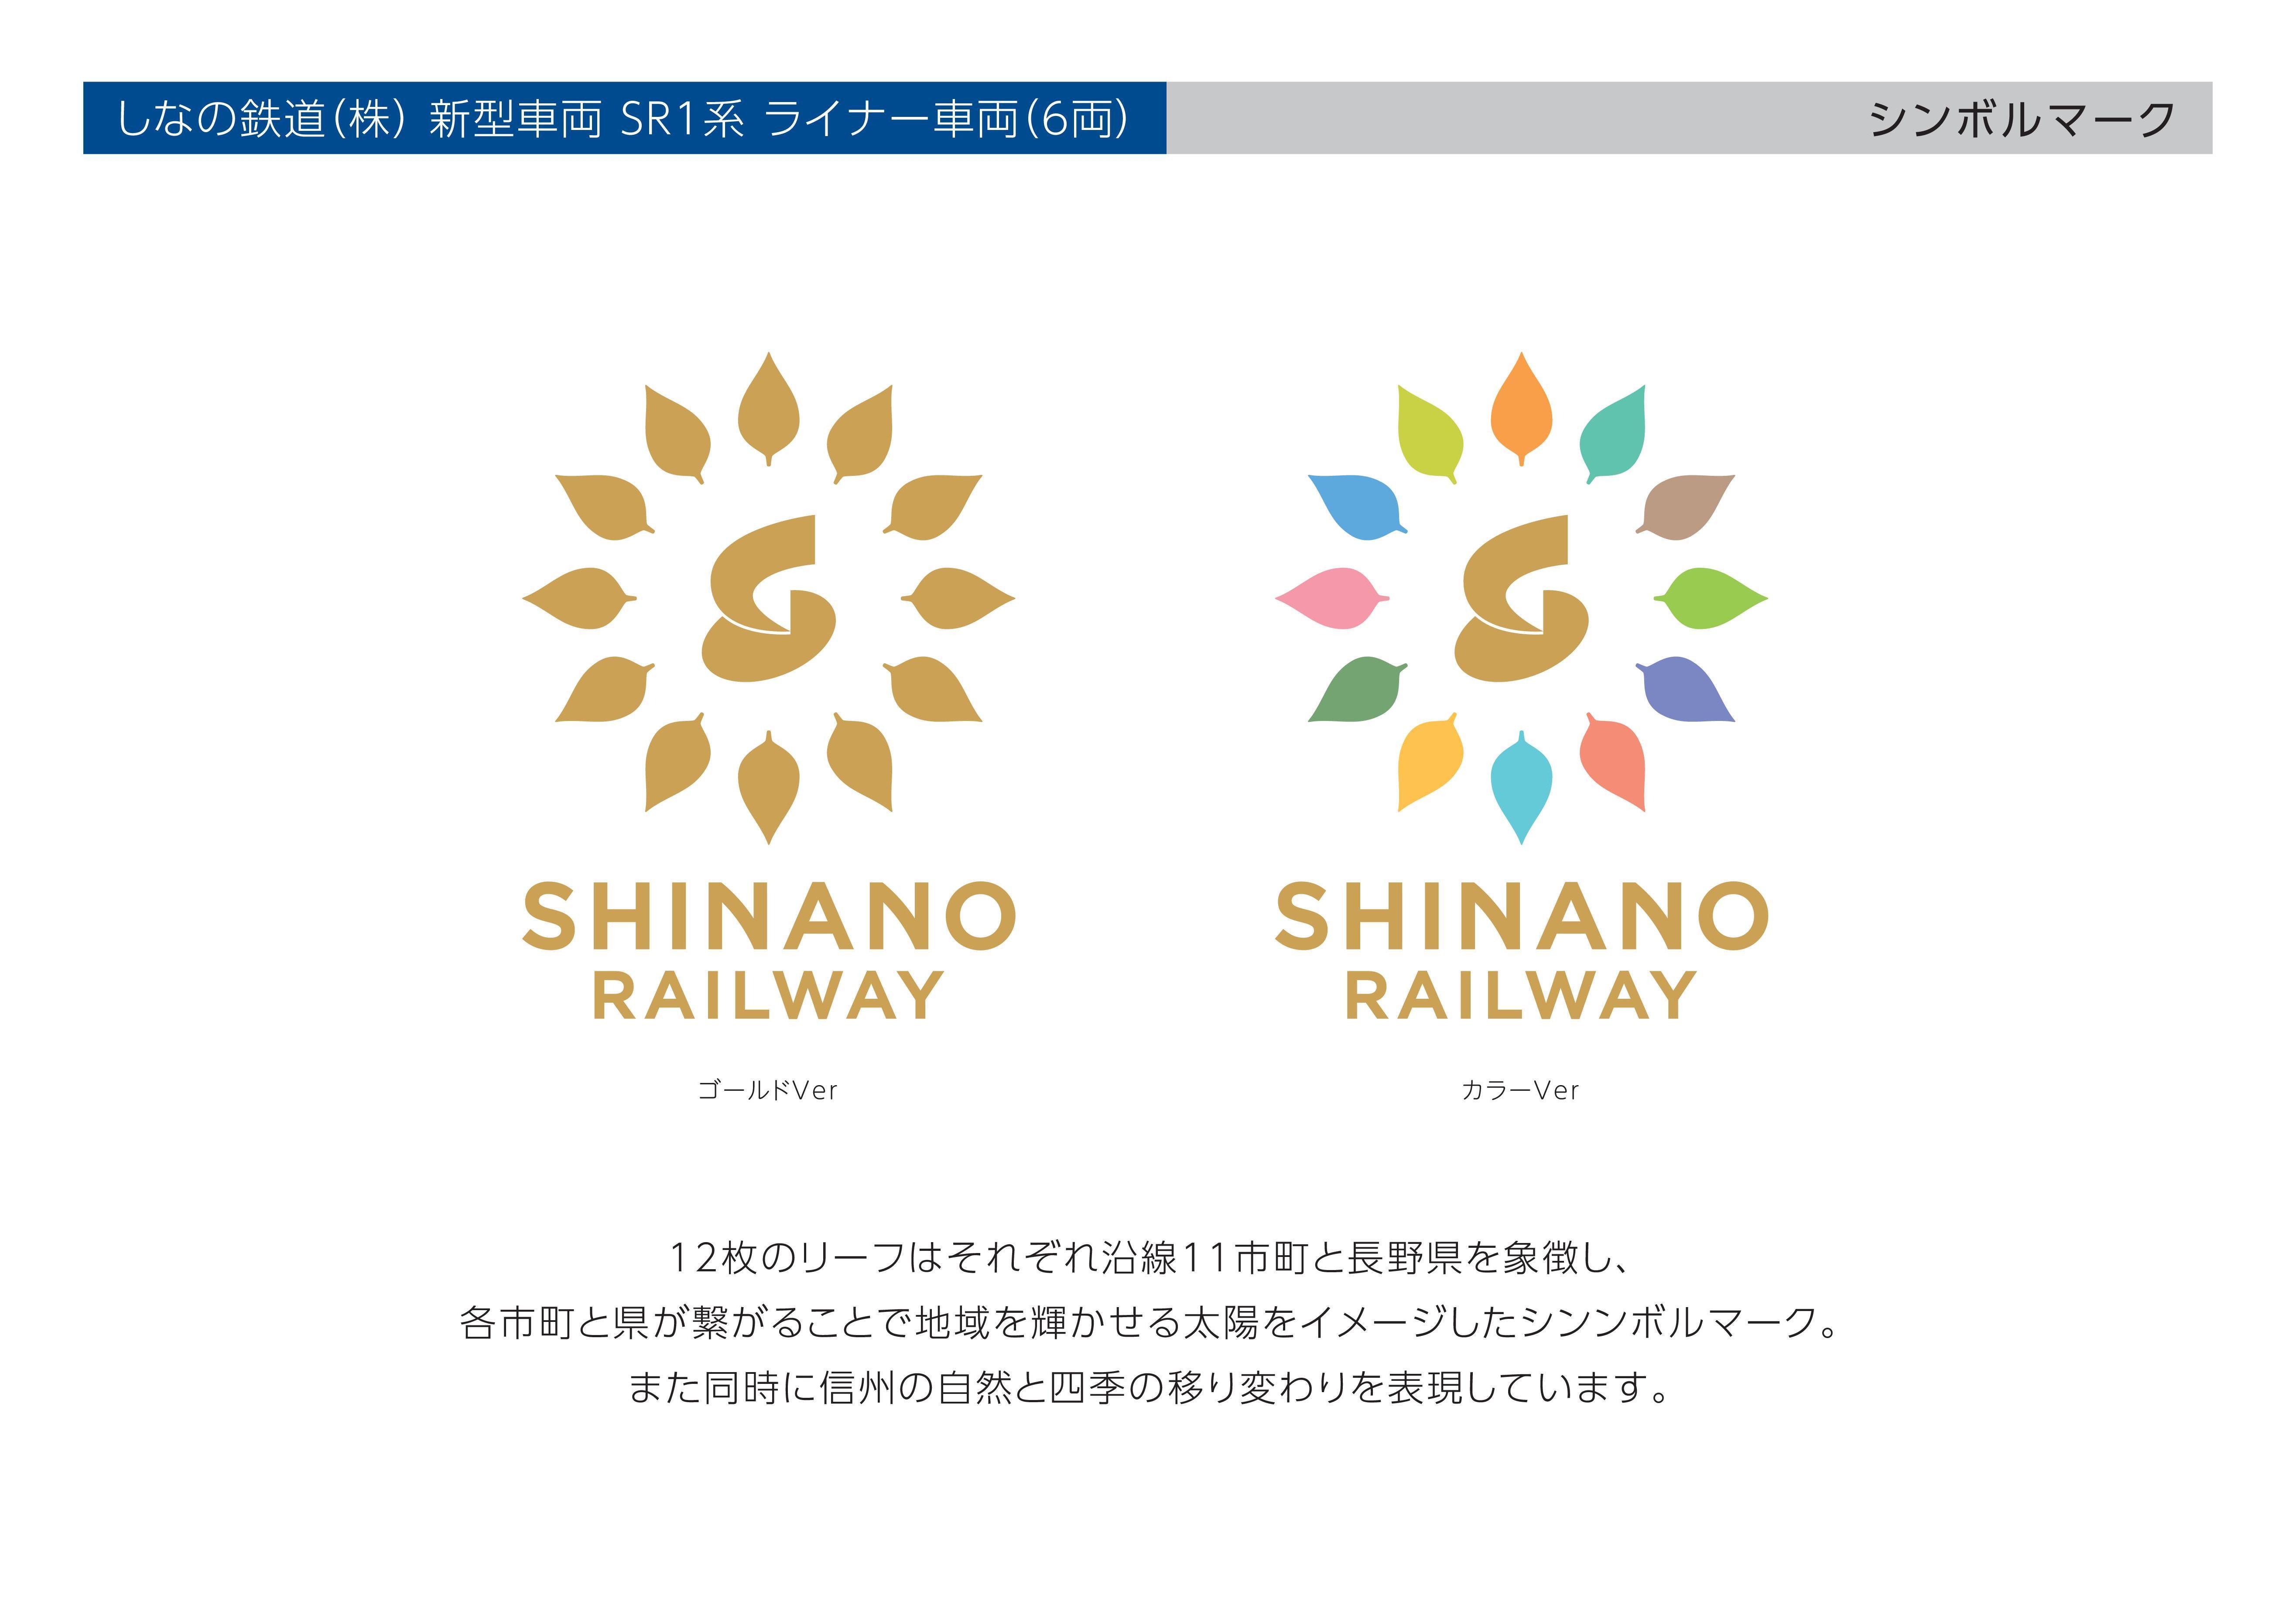 SR_003.jpg